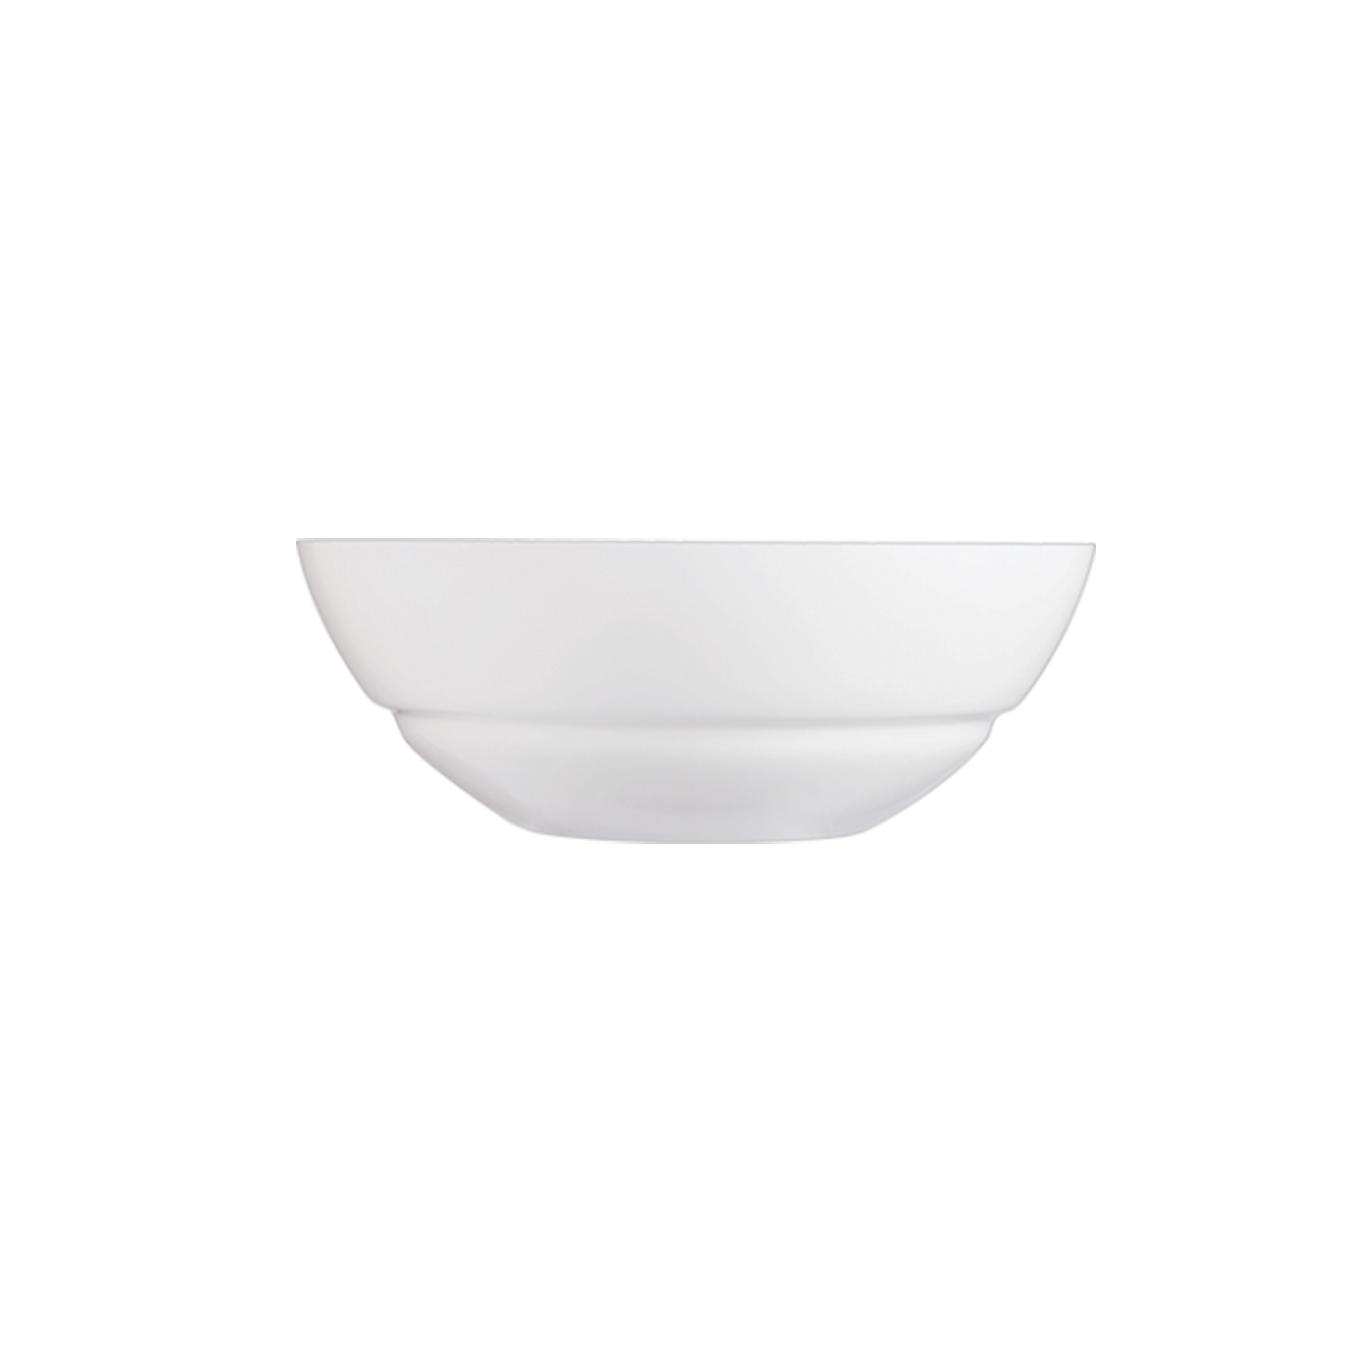 Black 16cm Harena Multi Purpose Bowl